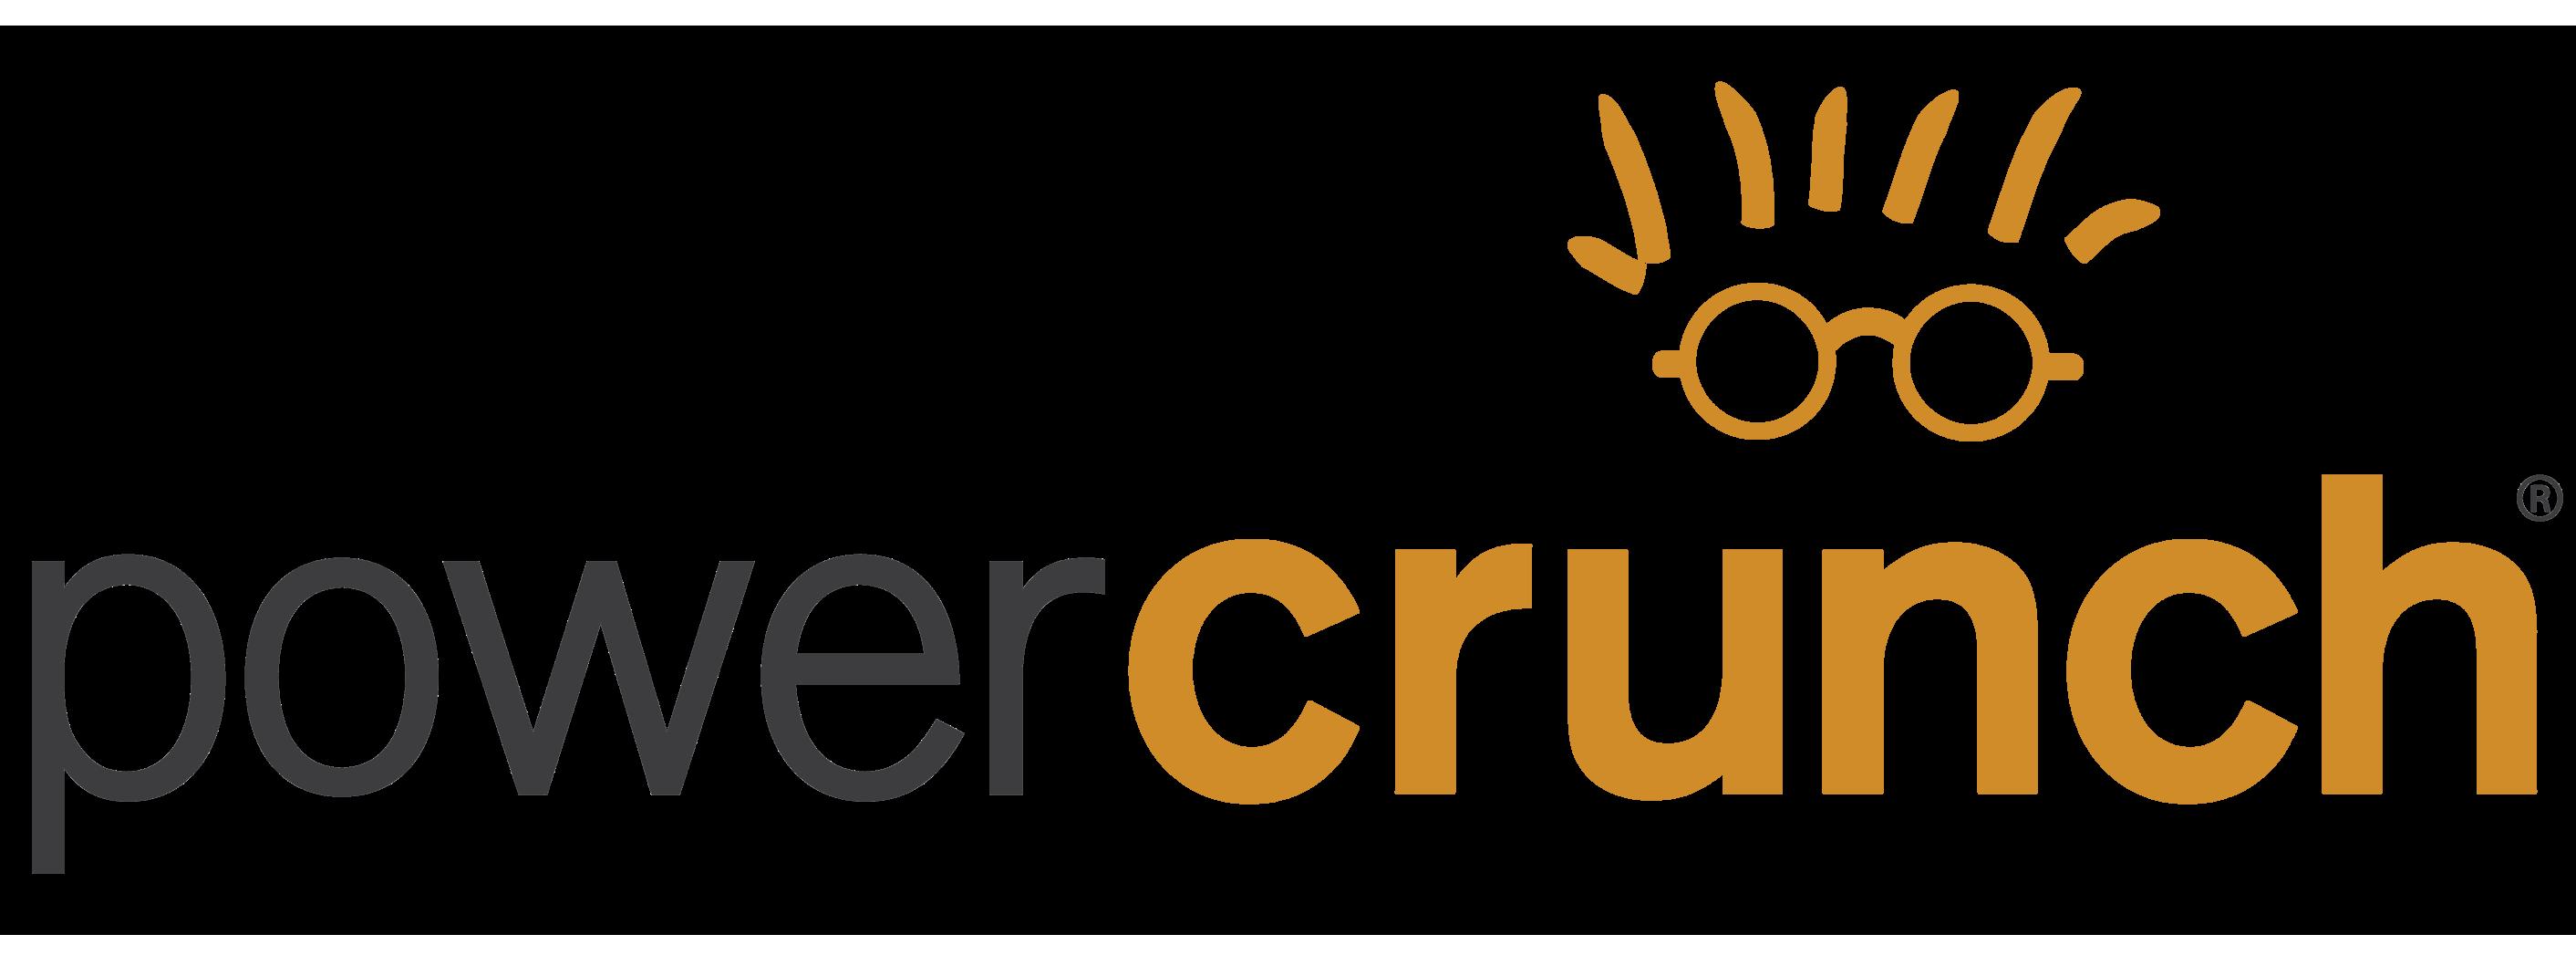 Power Crunch – Logos Download